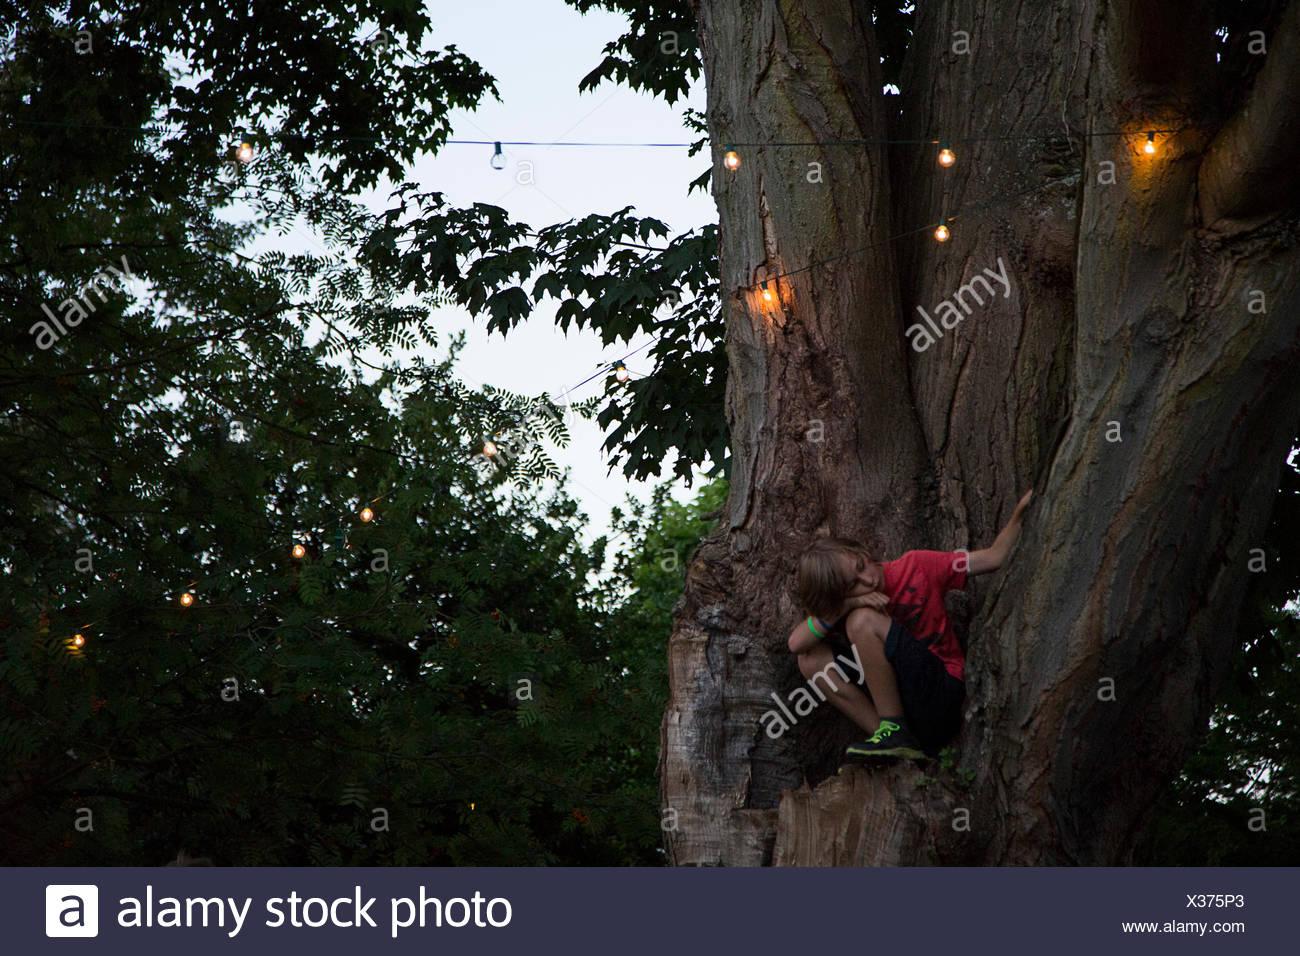 Boy sitting halfway up tree - Stock Image